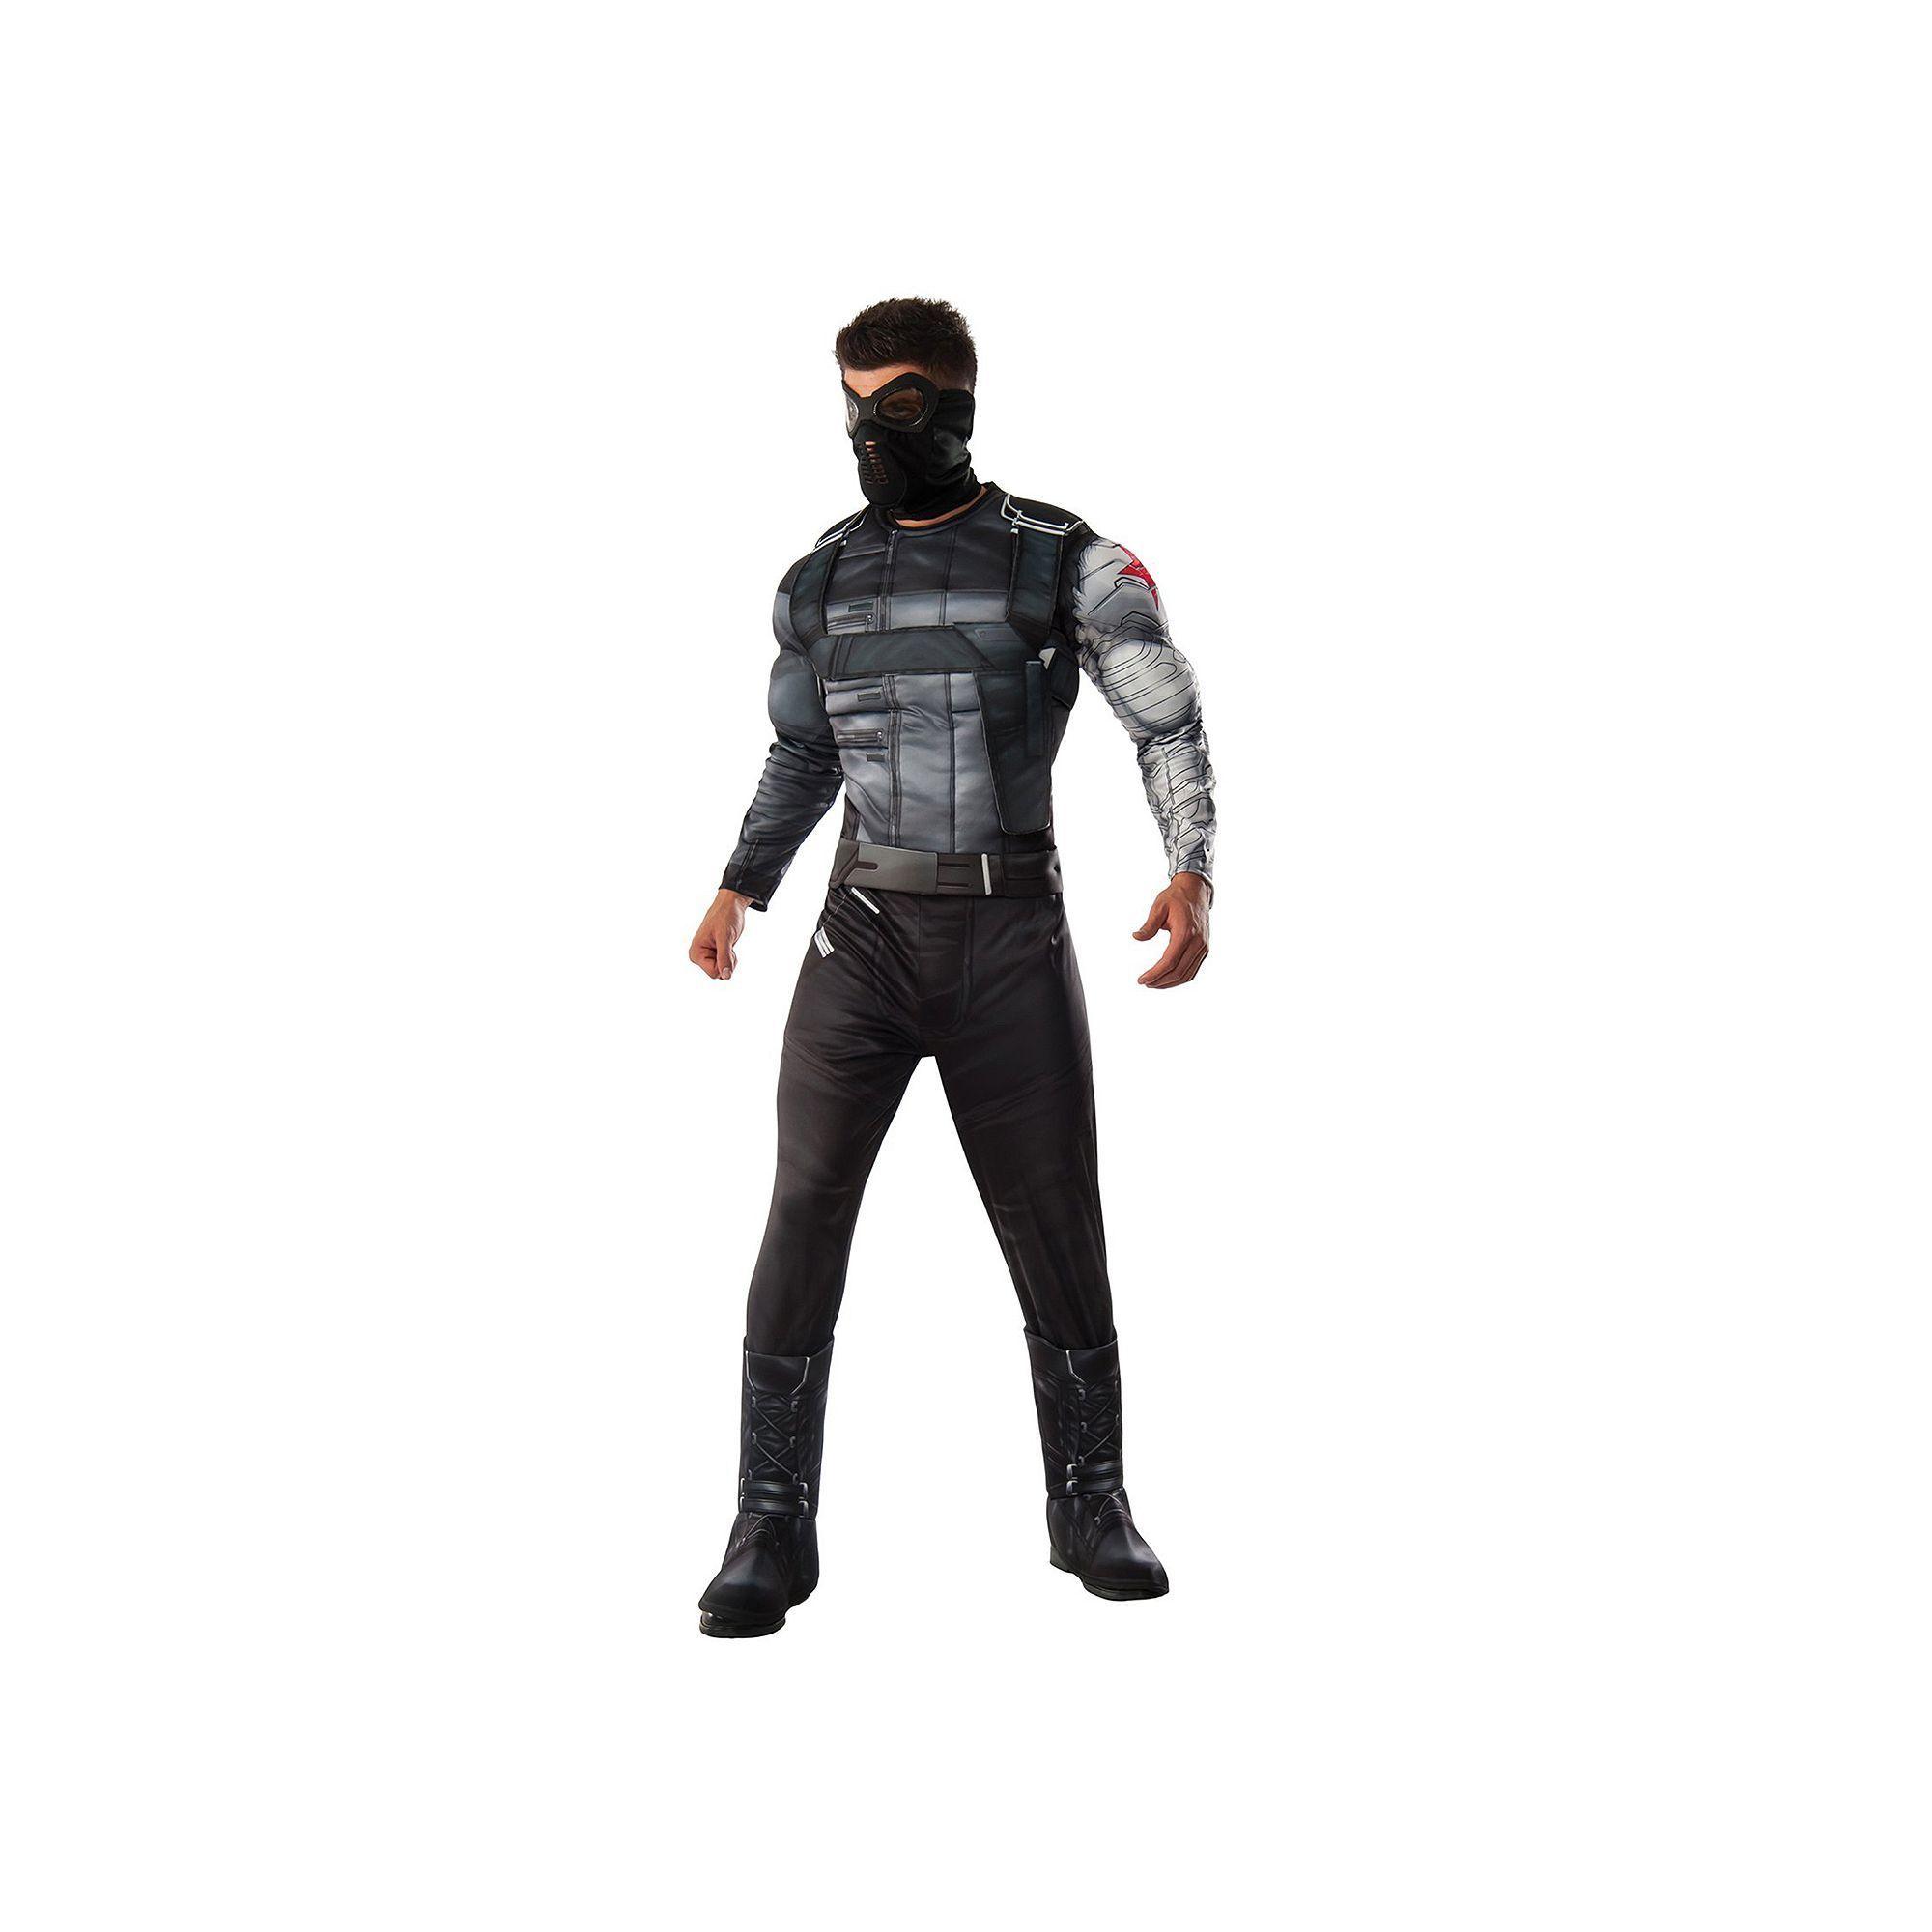 d3f47bec9fe Adult Marvel Captain America  Civil War Winter Soldier Deluxe Costume